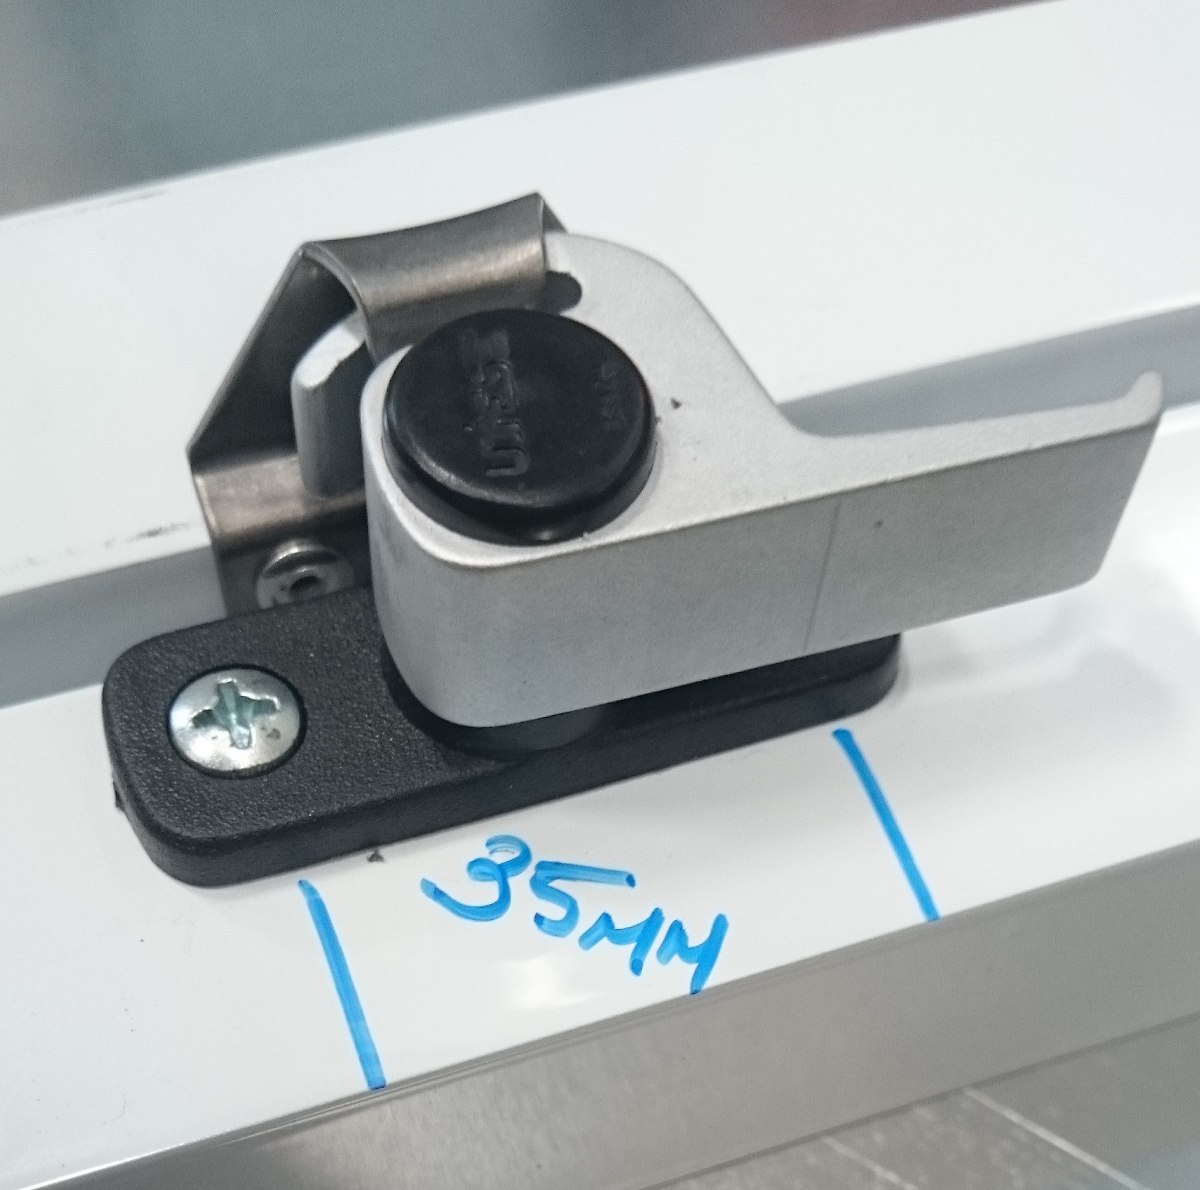 #1682B5 Fecho Orelha Para Janela Ou Porta De Alumínio (2 Peças) R$ 24 00  4088 Fecho Japones Janela De Aluminio